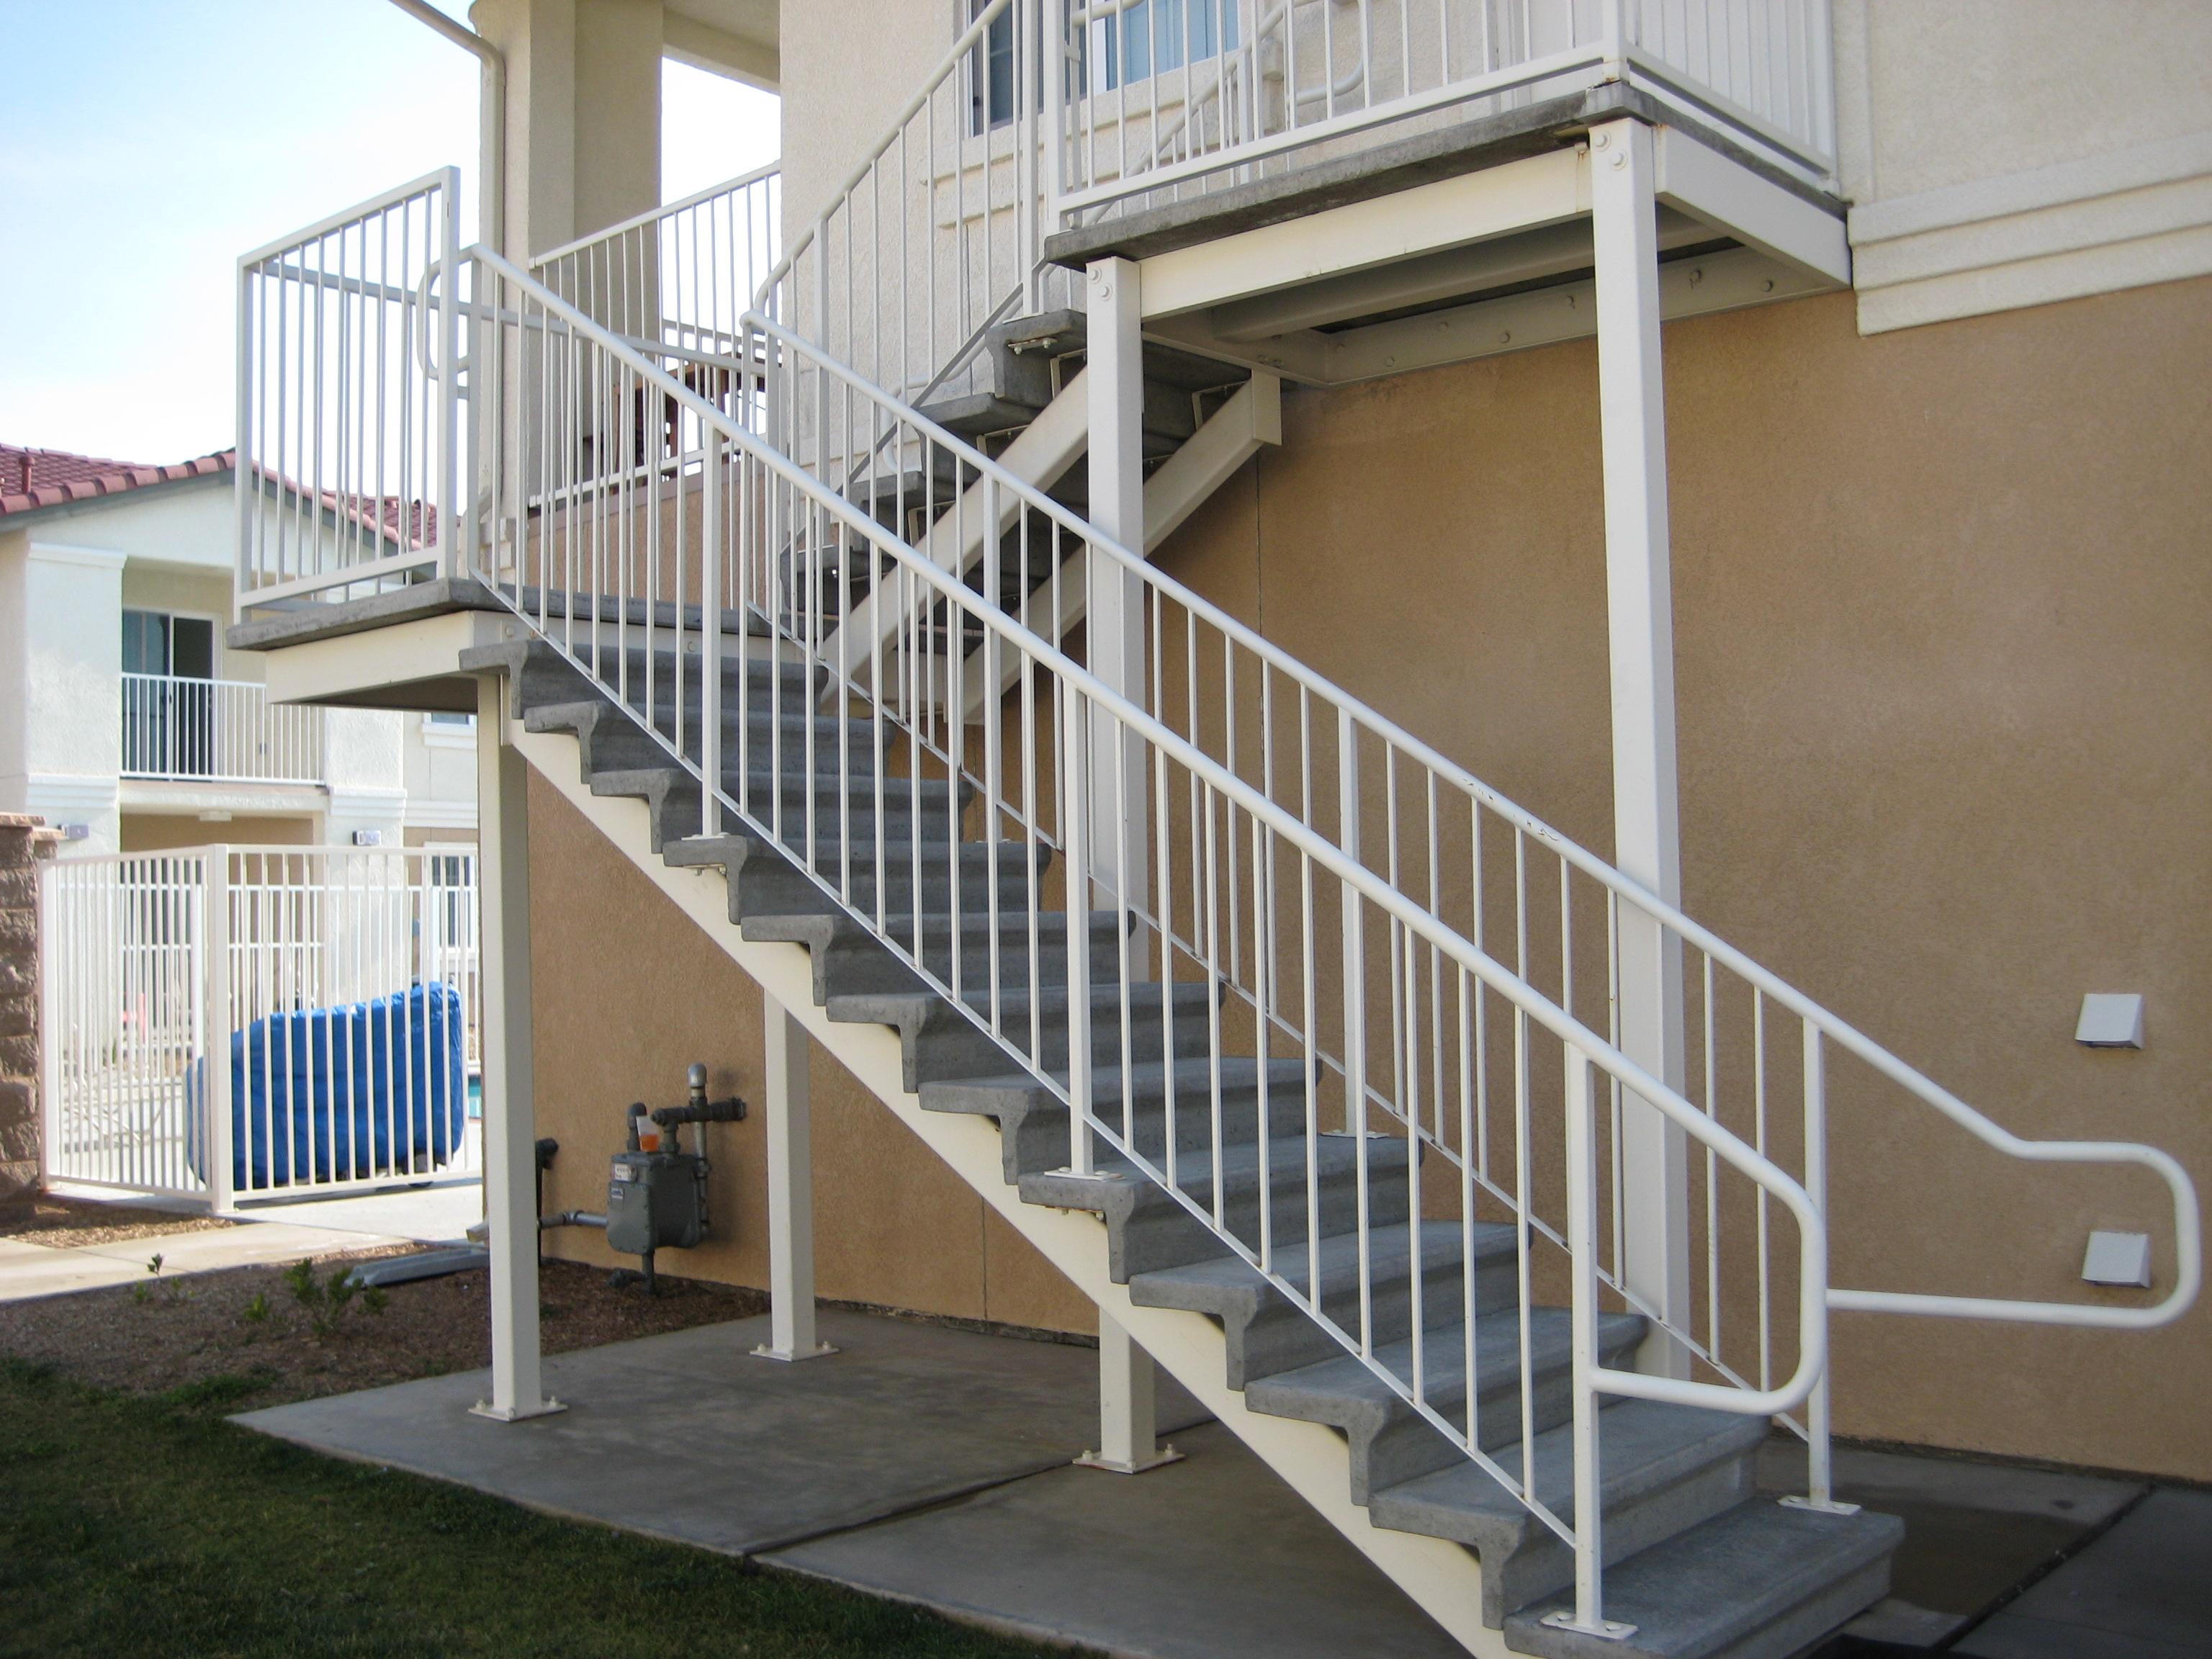 Bertelson Precast Versa Tread Stair Amp Riser System Image